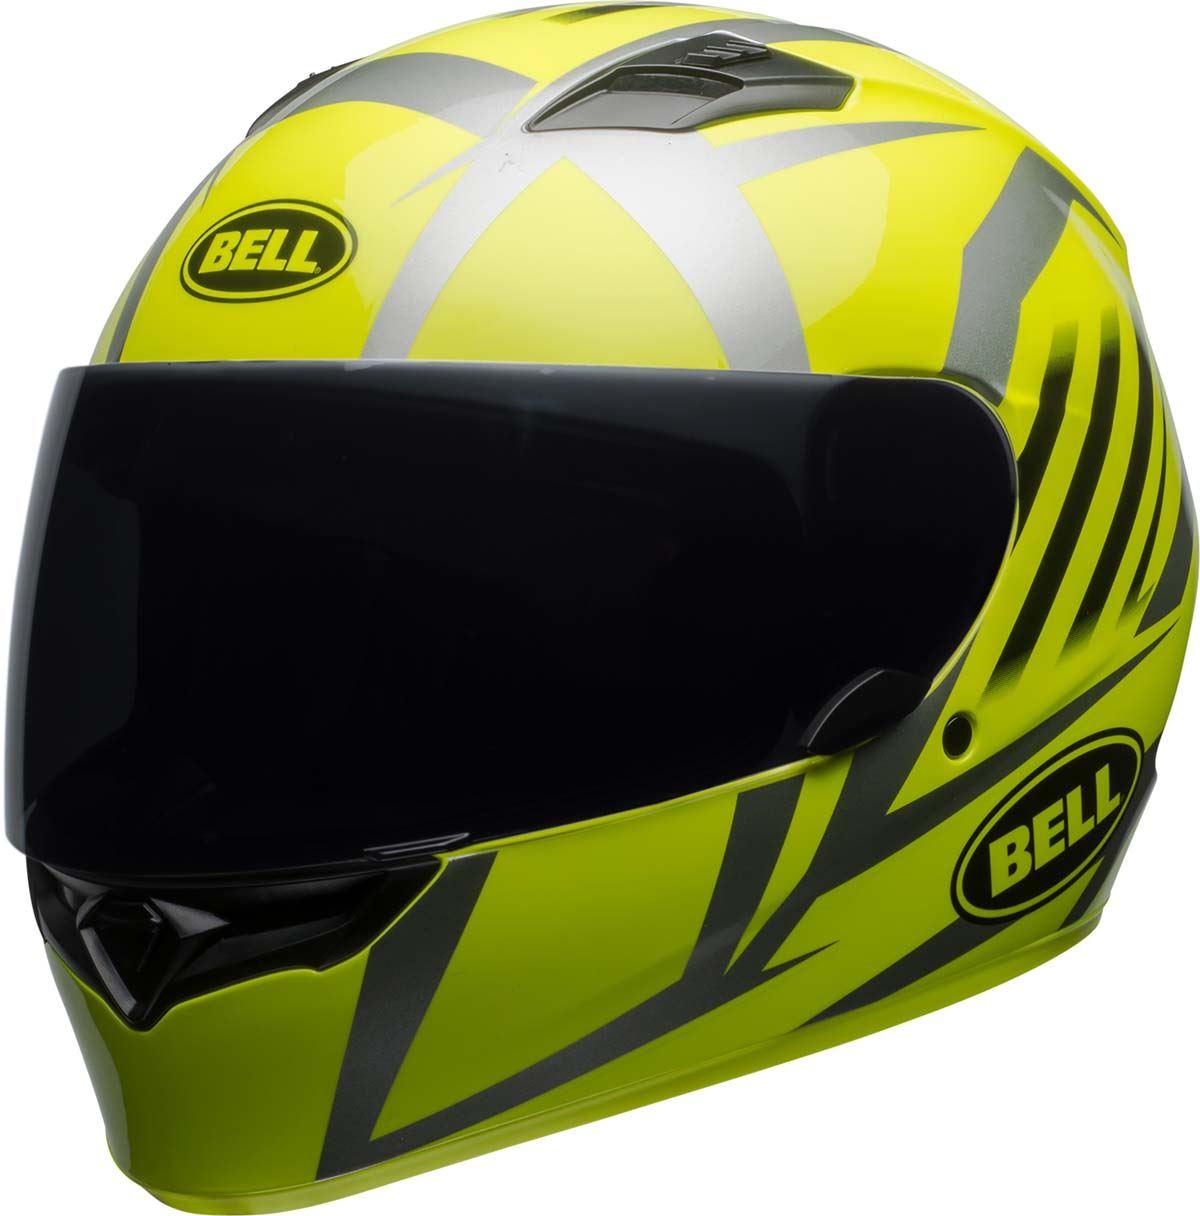 Bell-Qualifier-Helmet-Full-Face-Motorcycle-Clear-Shield-DOT-XS-3XL miniature 38